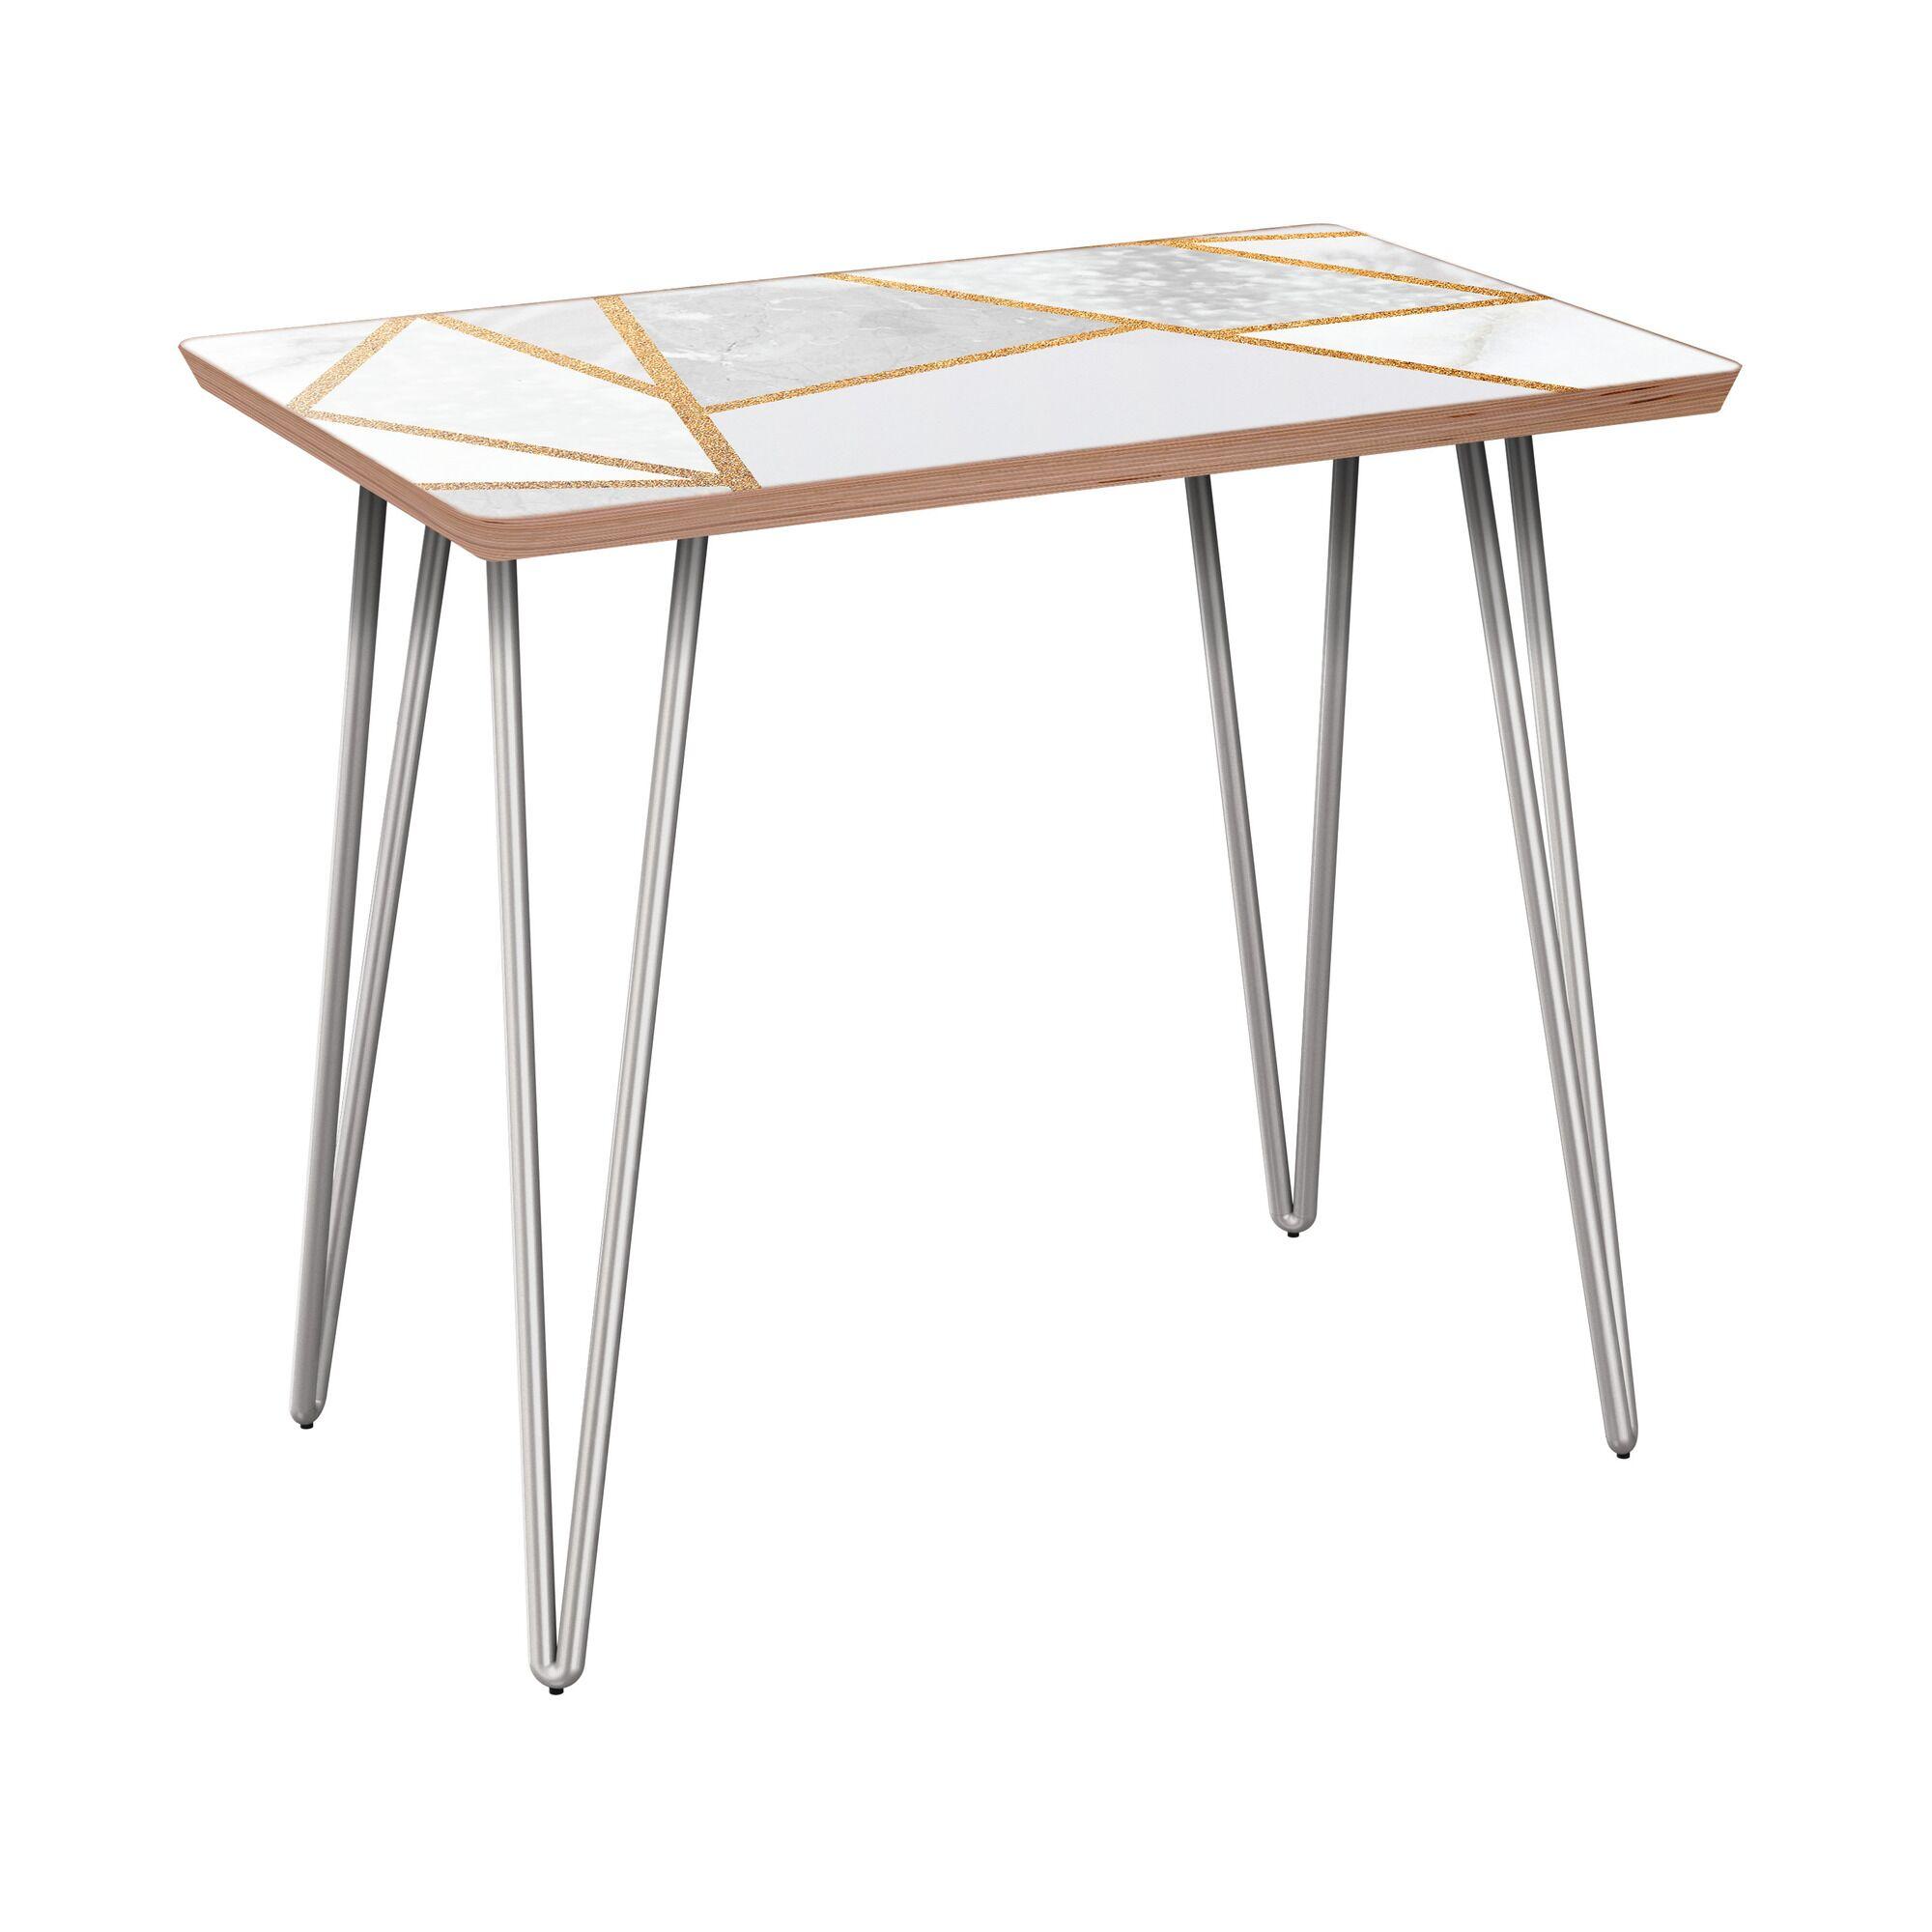 Gutshall End Table Table Base Color: Chrome, Table Top Color: Walnut